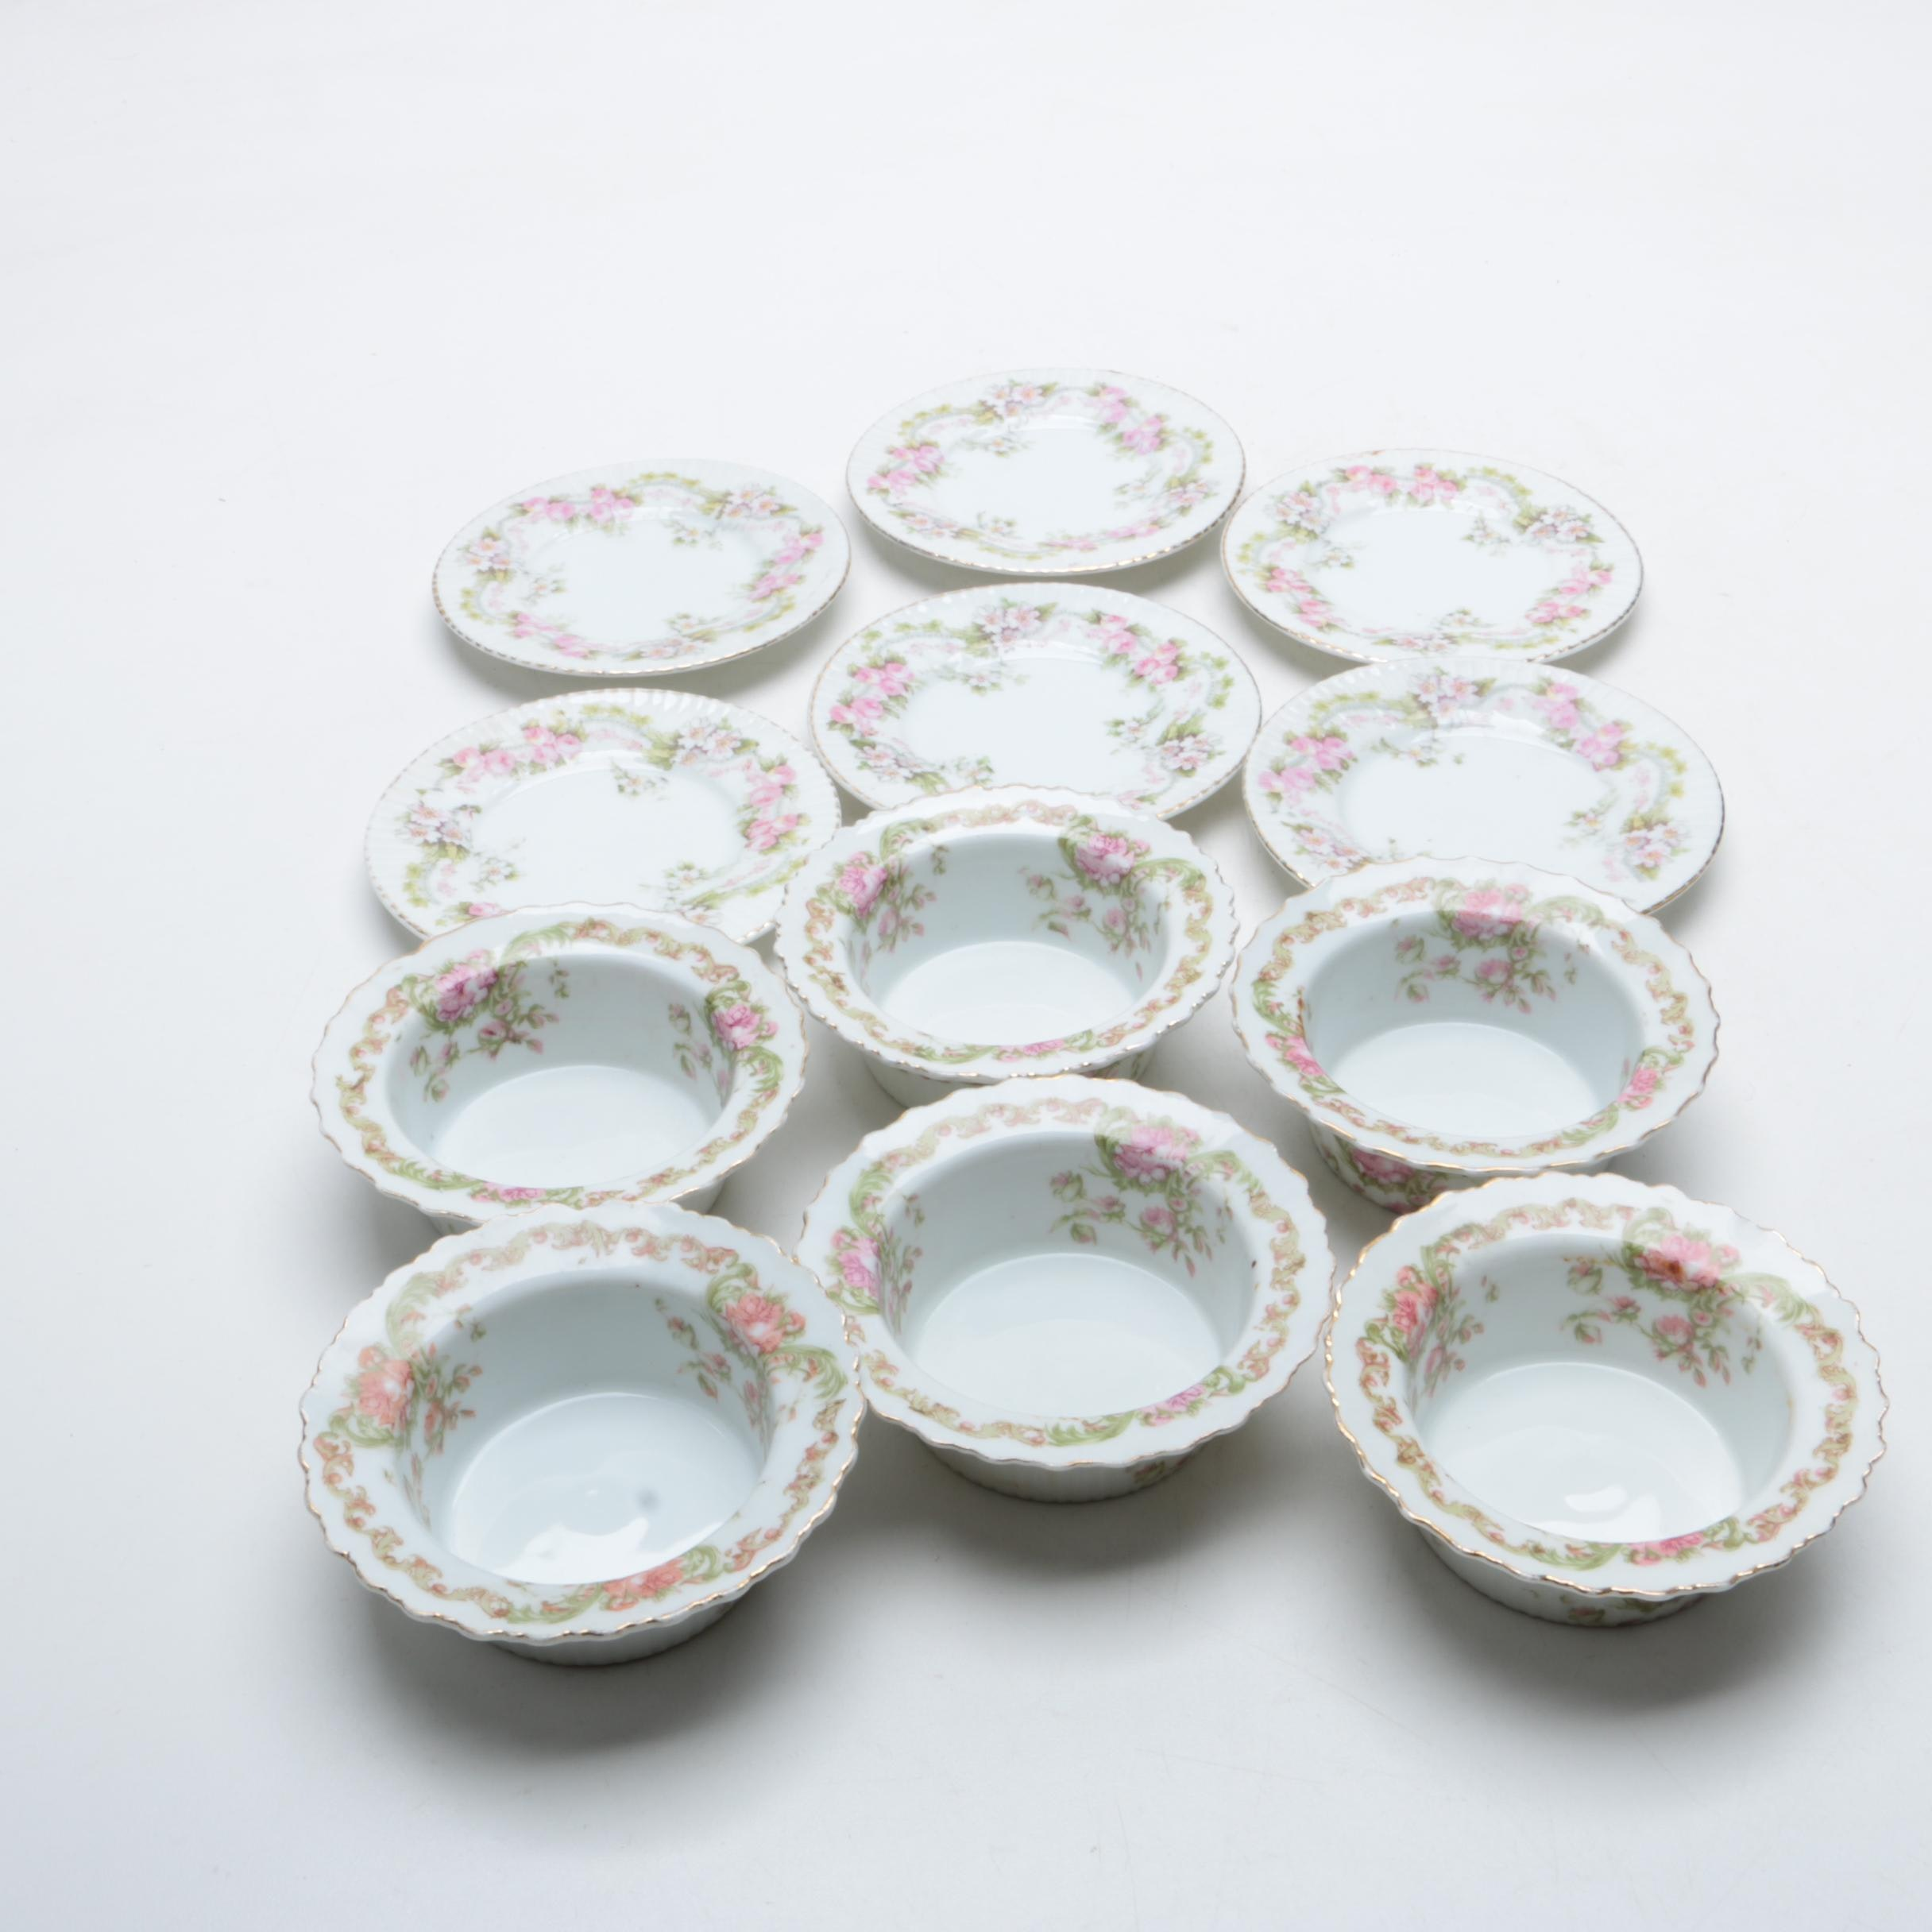 Z.C. & Co. Scherzer Porcelain Ramekins and Underplates